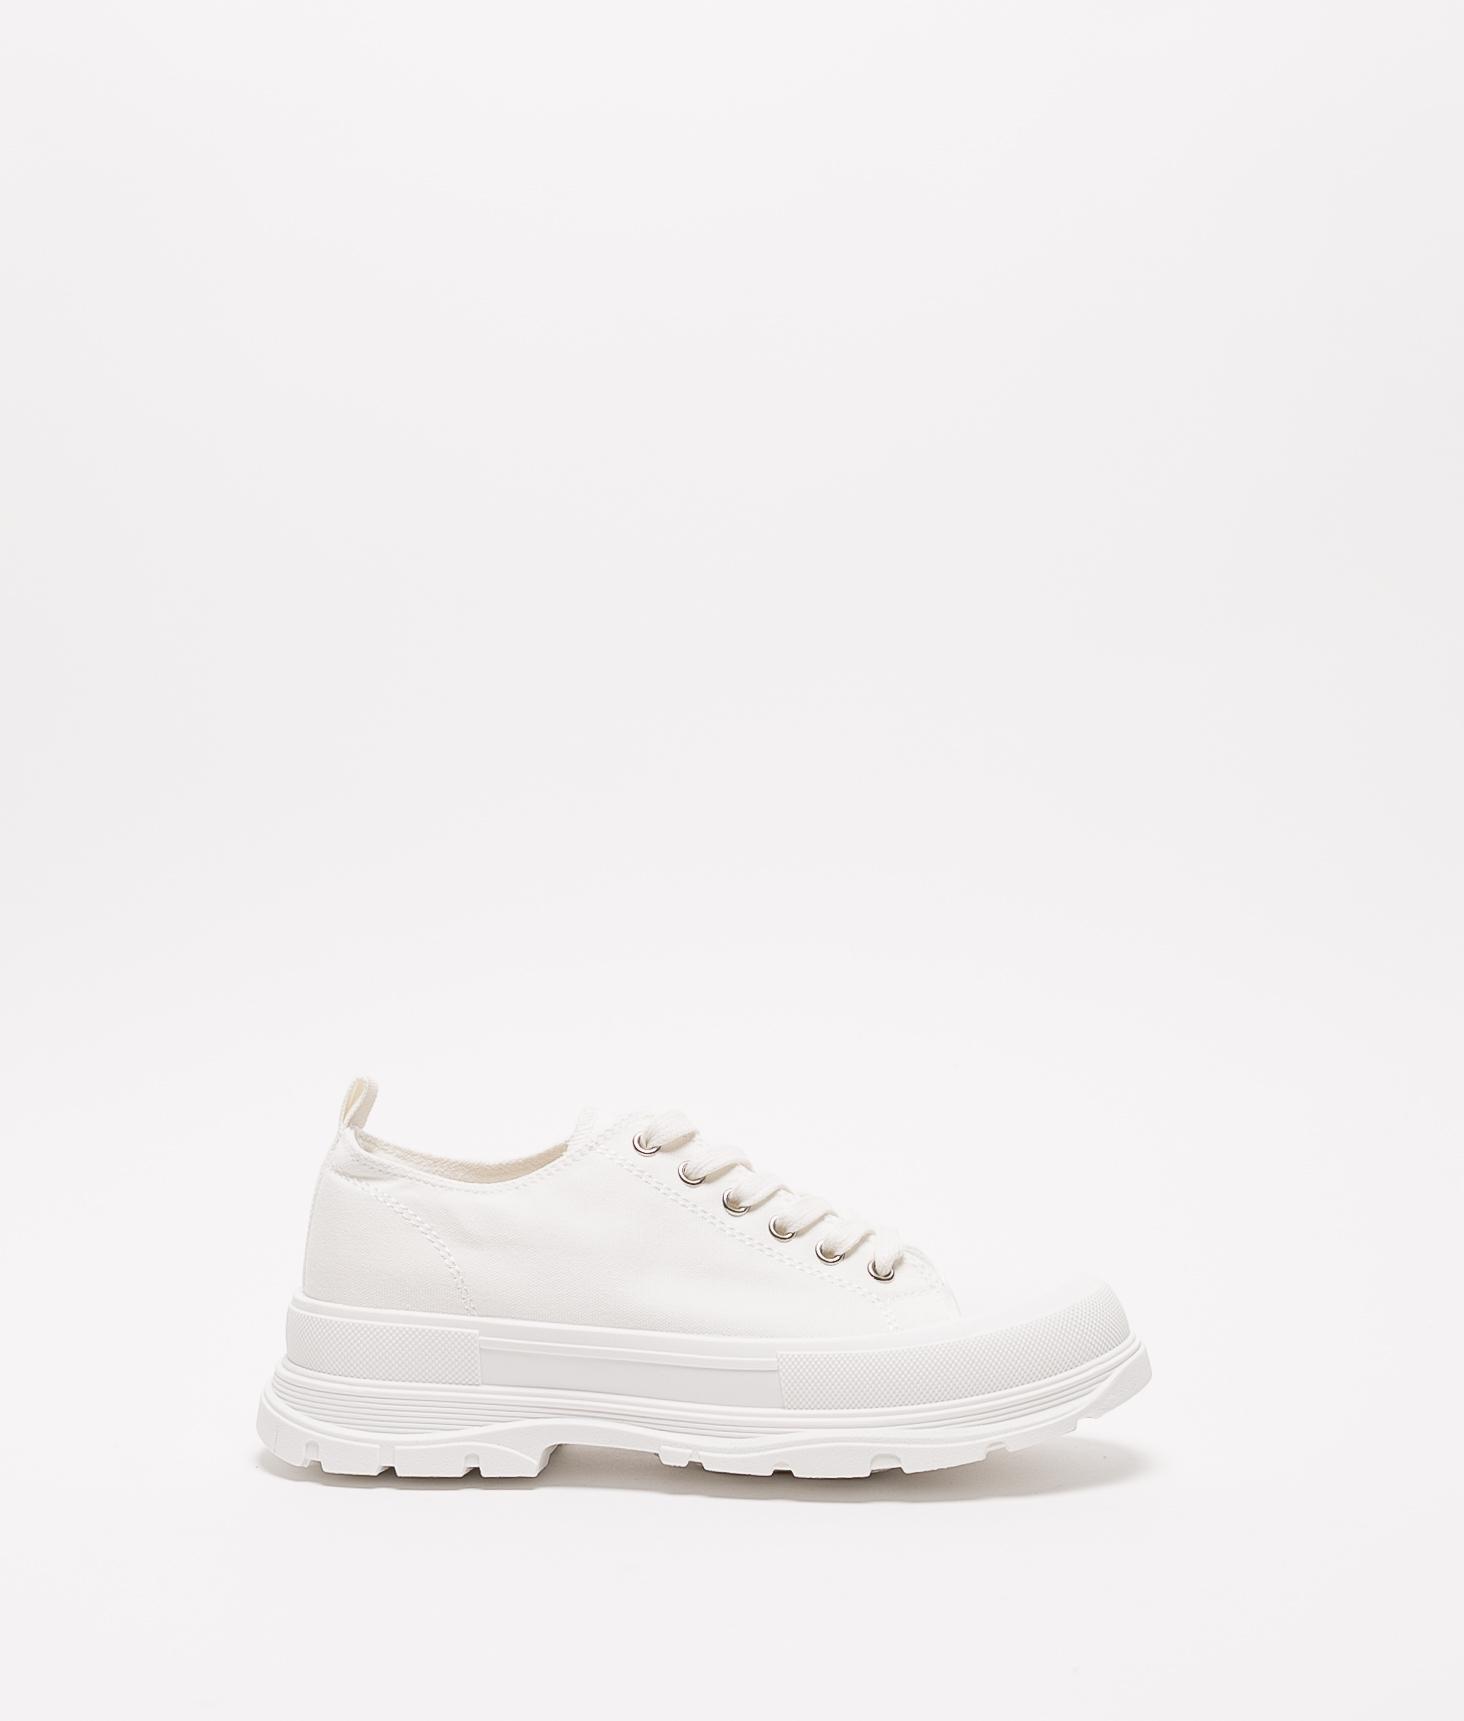 Sneakers Kele - White